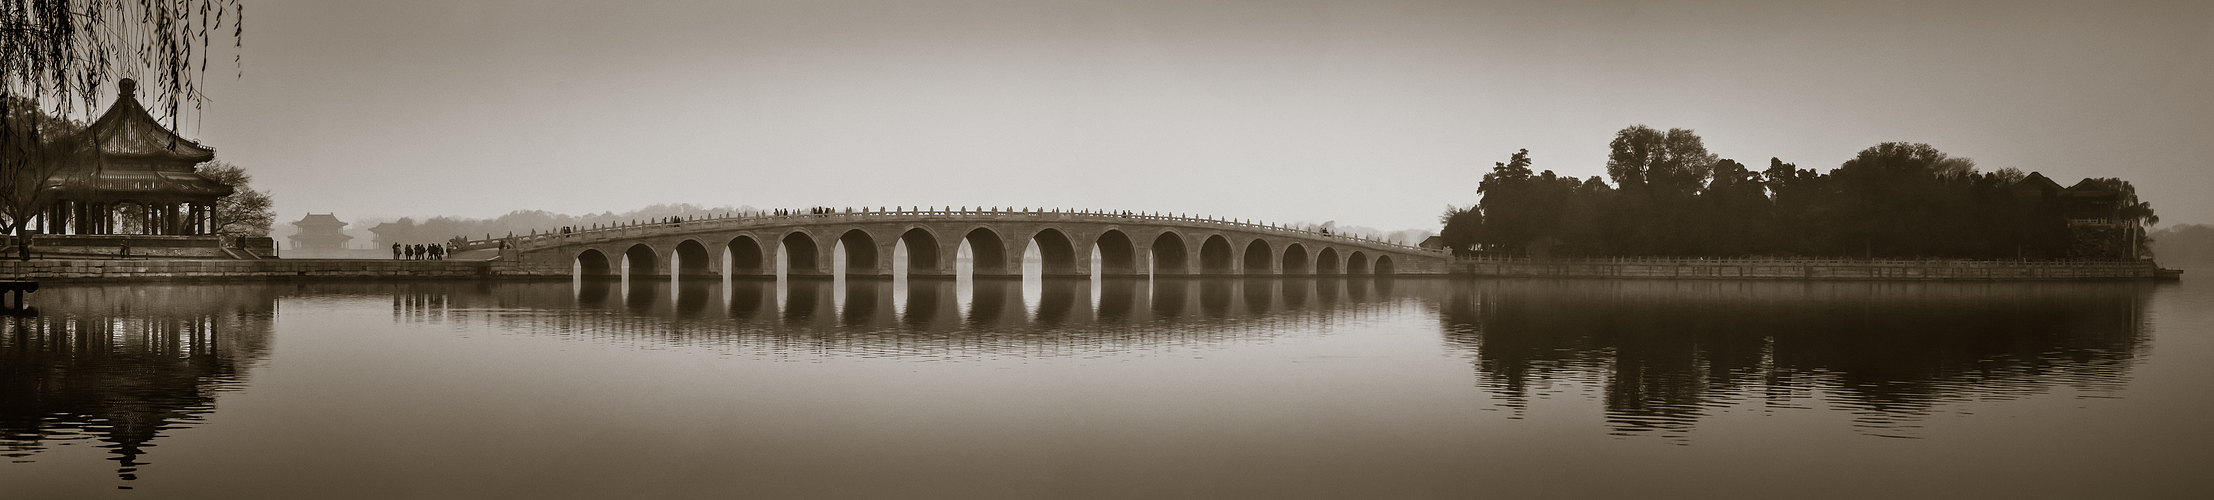 ~ 17-Bogen-Brücke ~